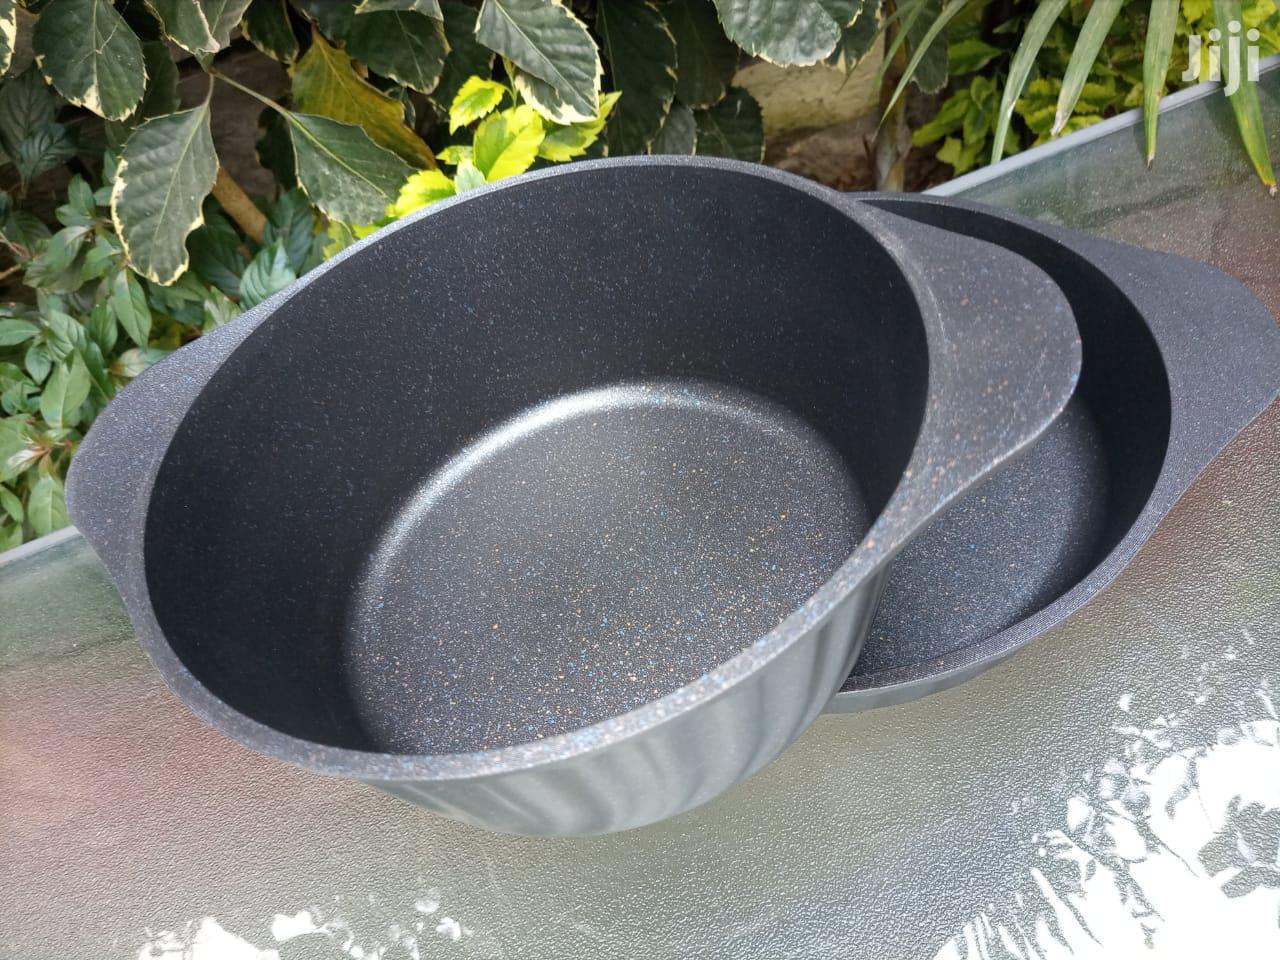 10pc Granite Cooking Pots German Brand   Kitchen & Dining for sale in Nairobi Central, Nairobi, Kenya